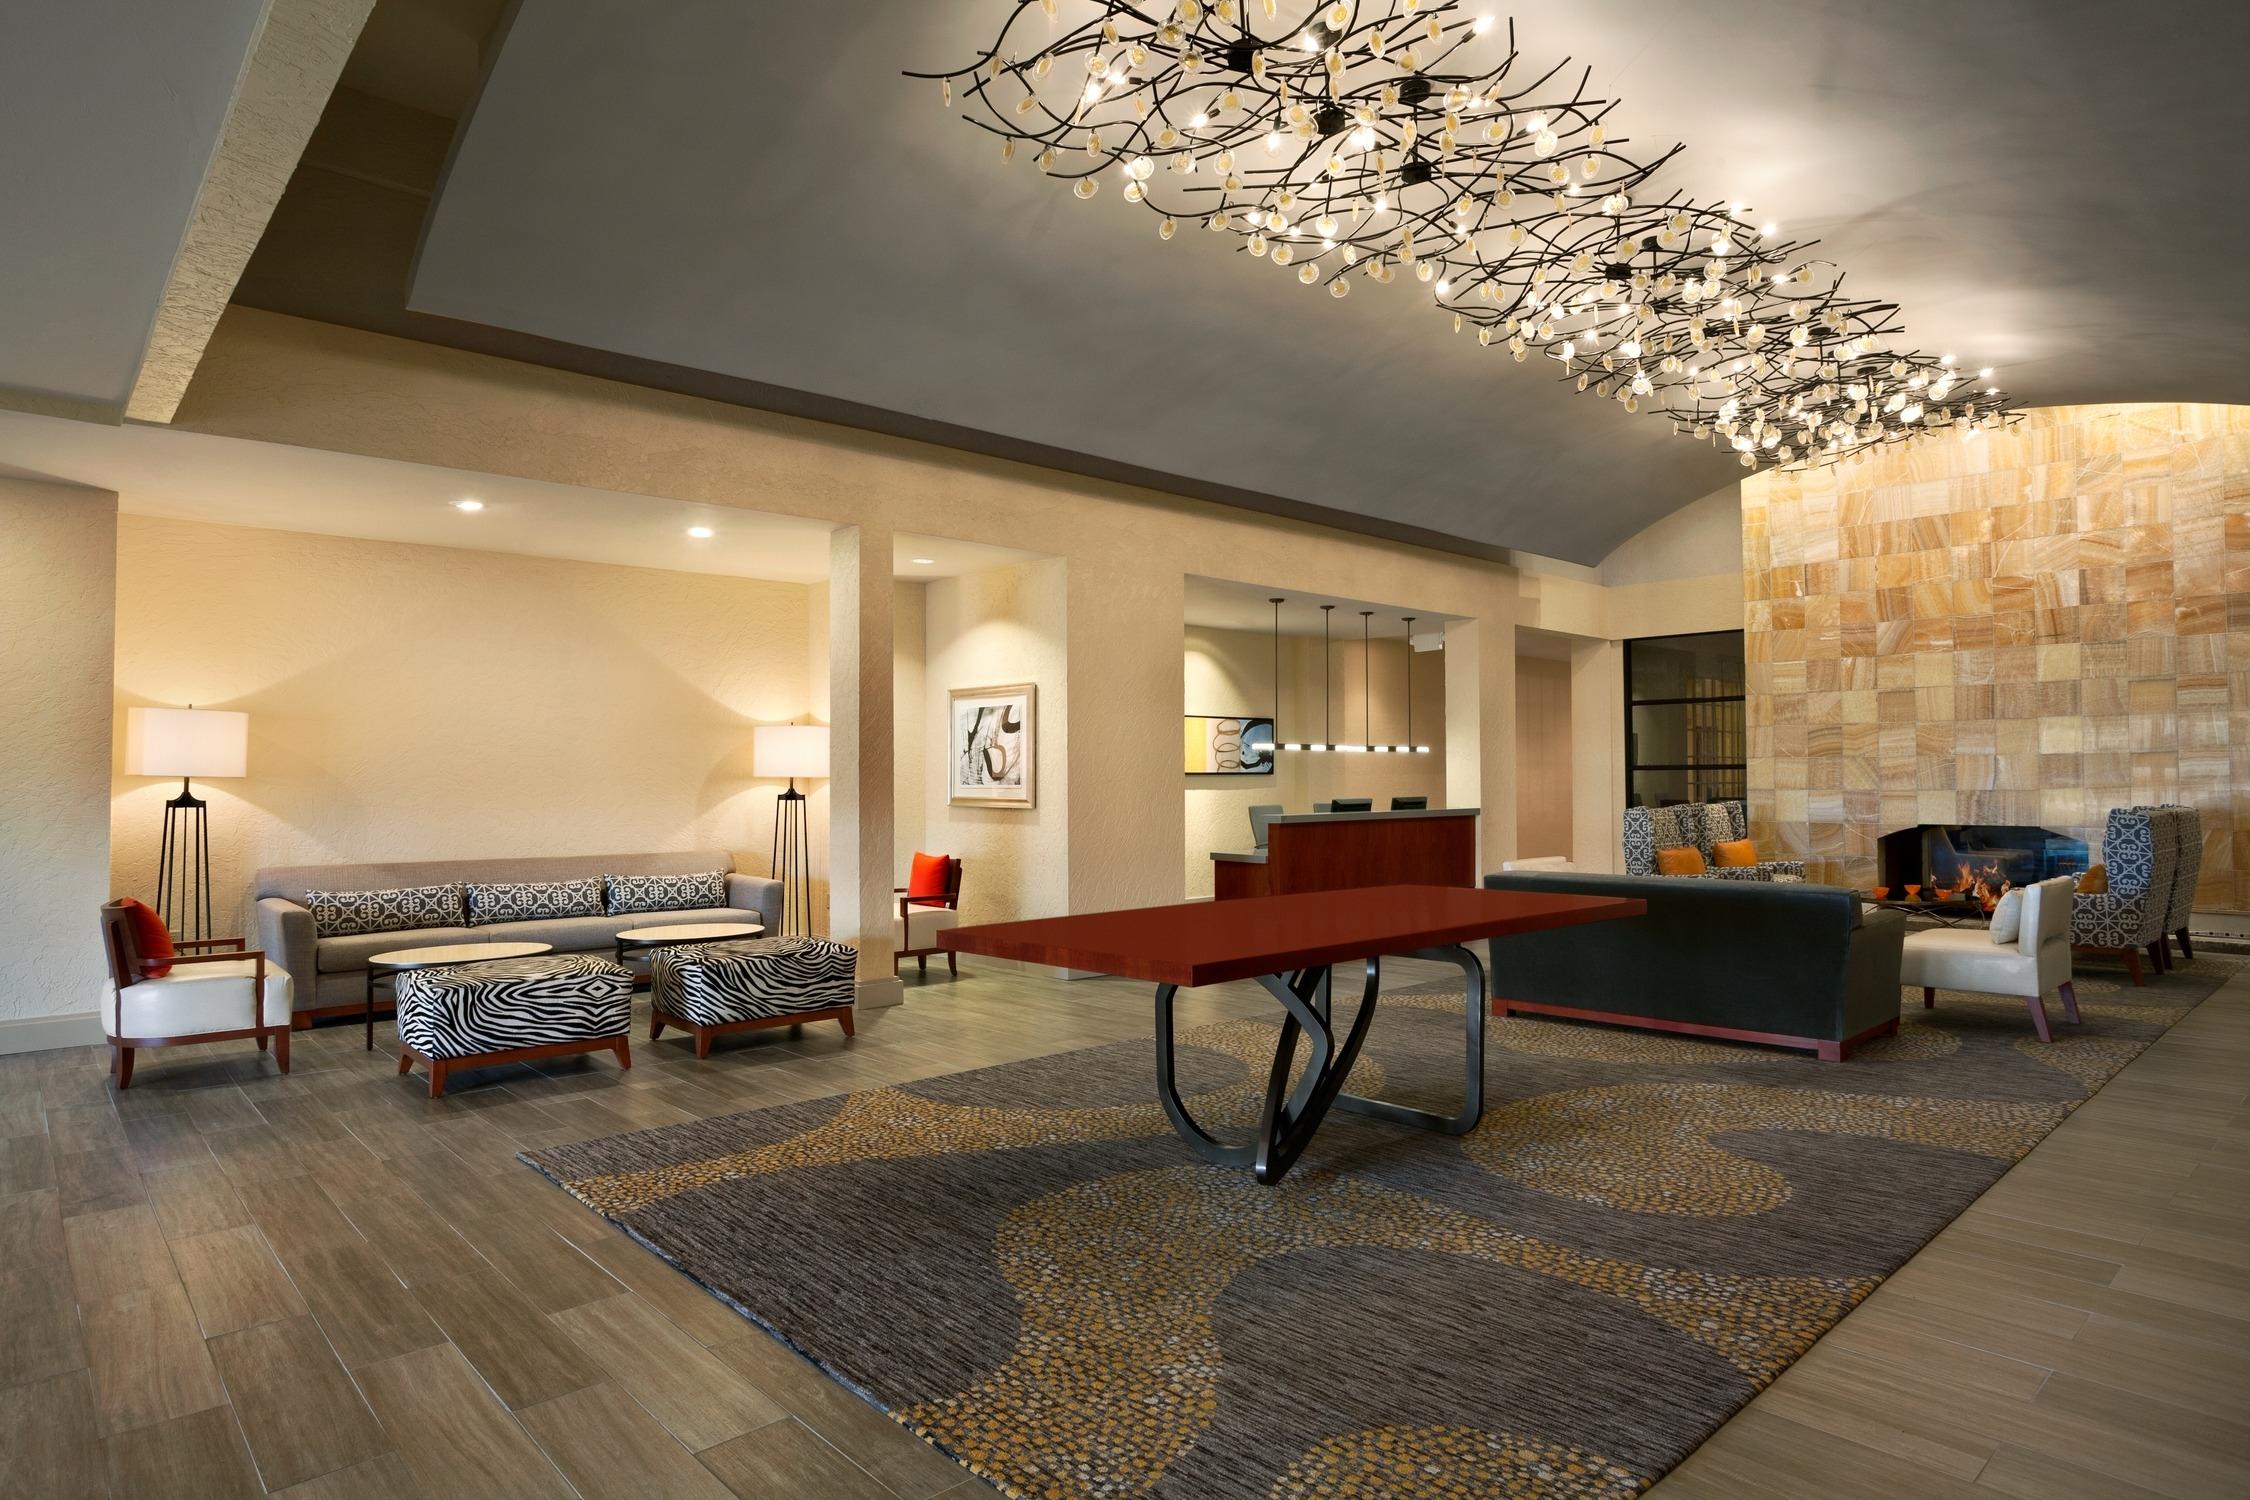 Doubletree By Hilton Hotel Salt Lake City Airport Salt Lake City Utah Ut